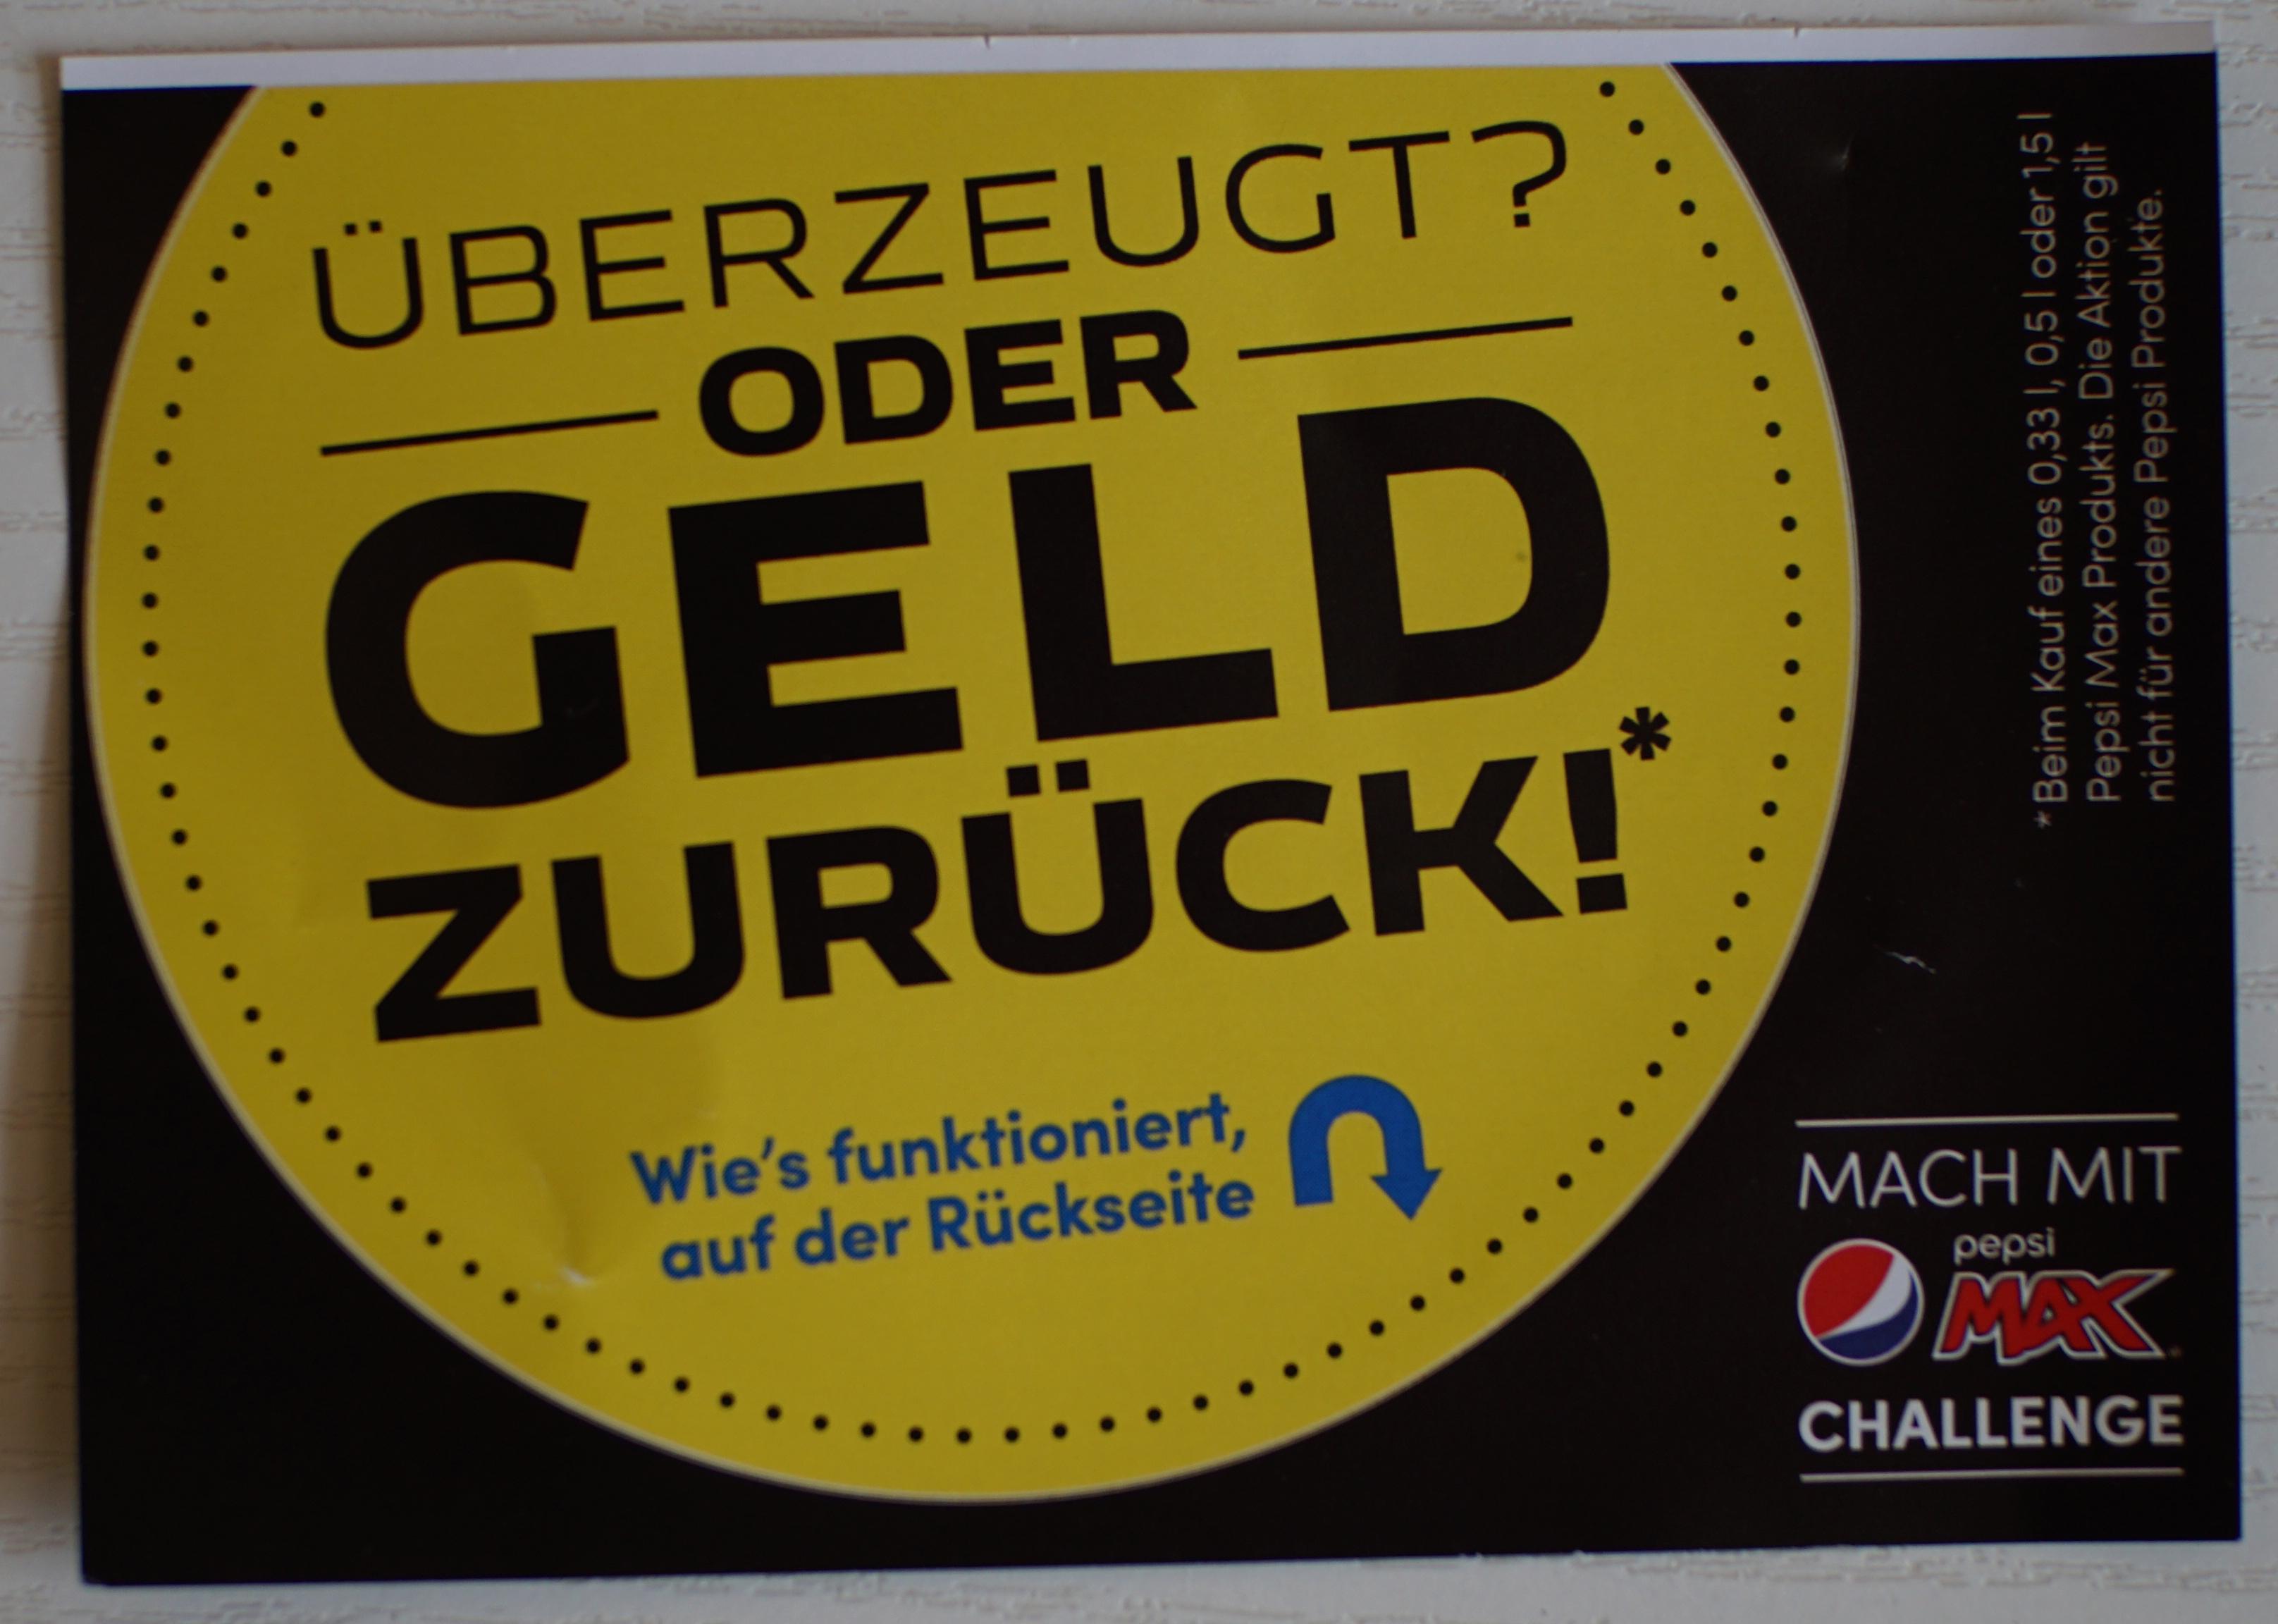 [GzG] Pepsi Max 0,33l, 0,5l oder 1,5l gratis testen